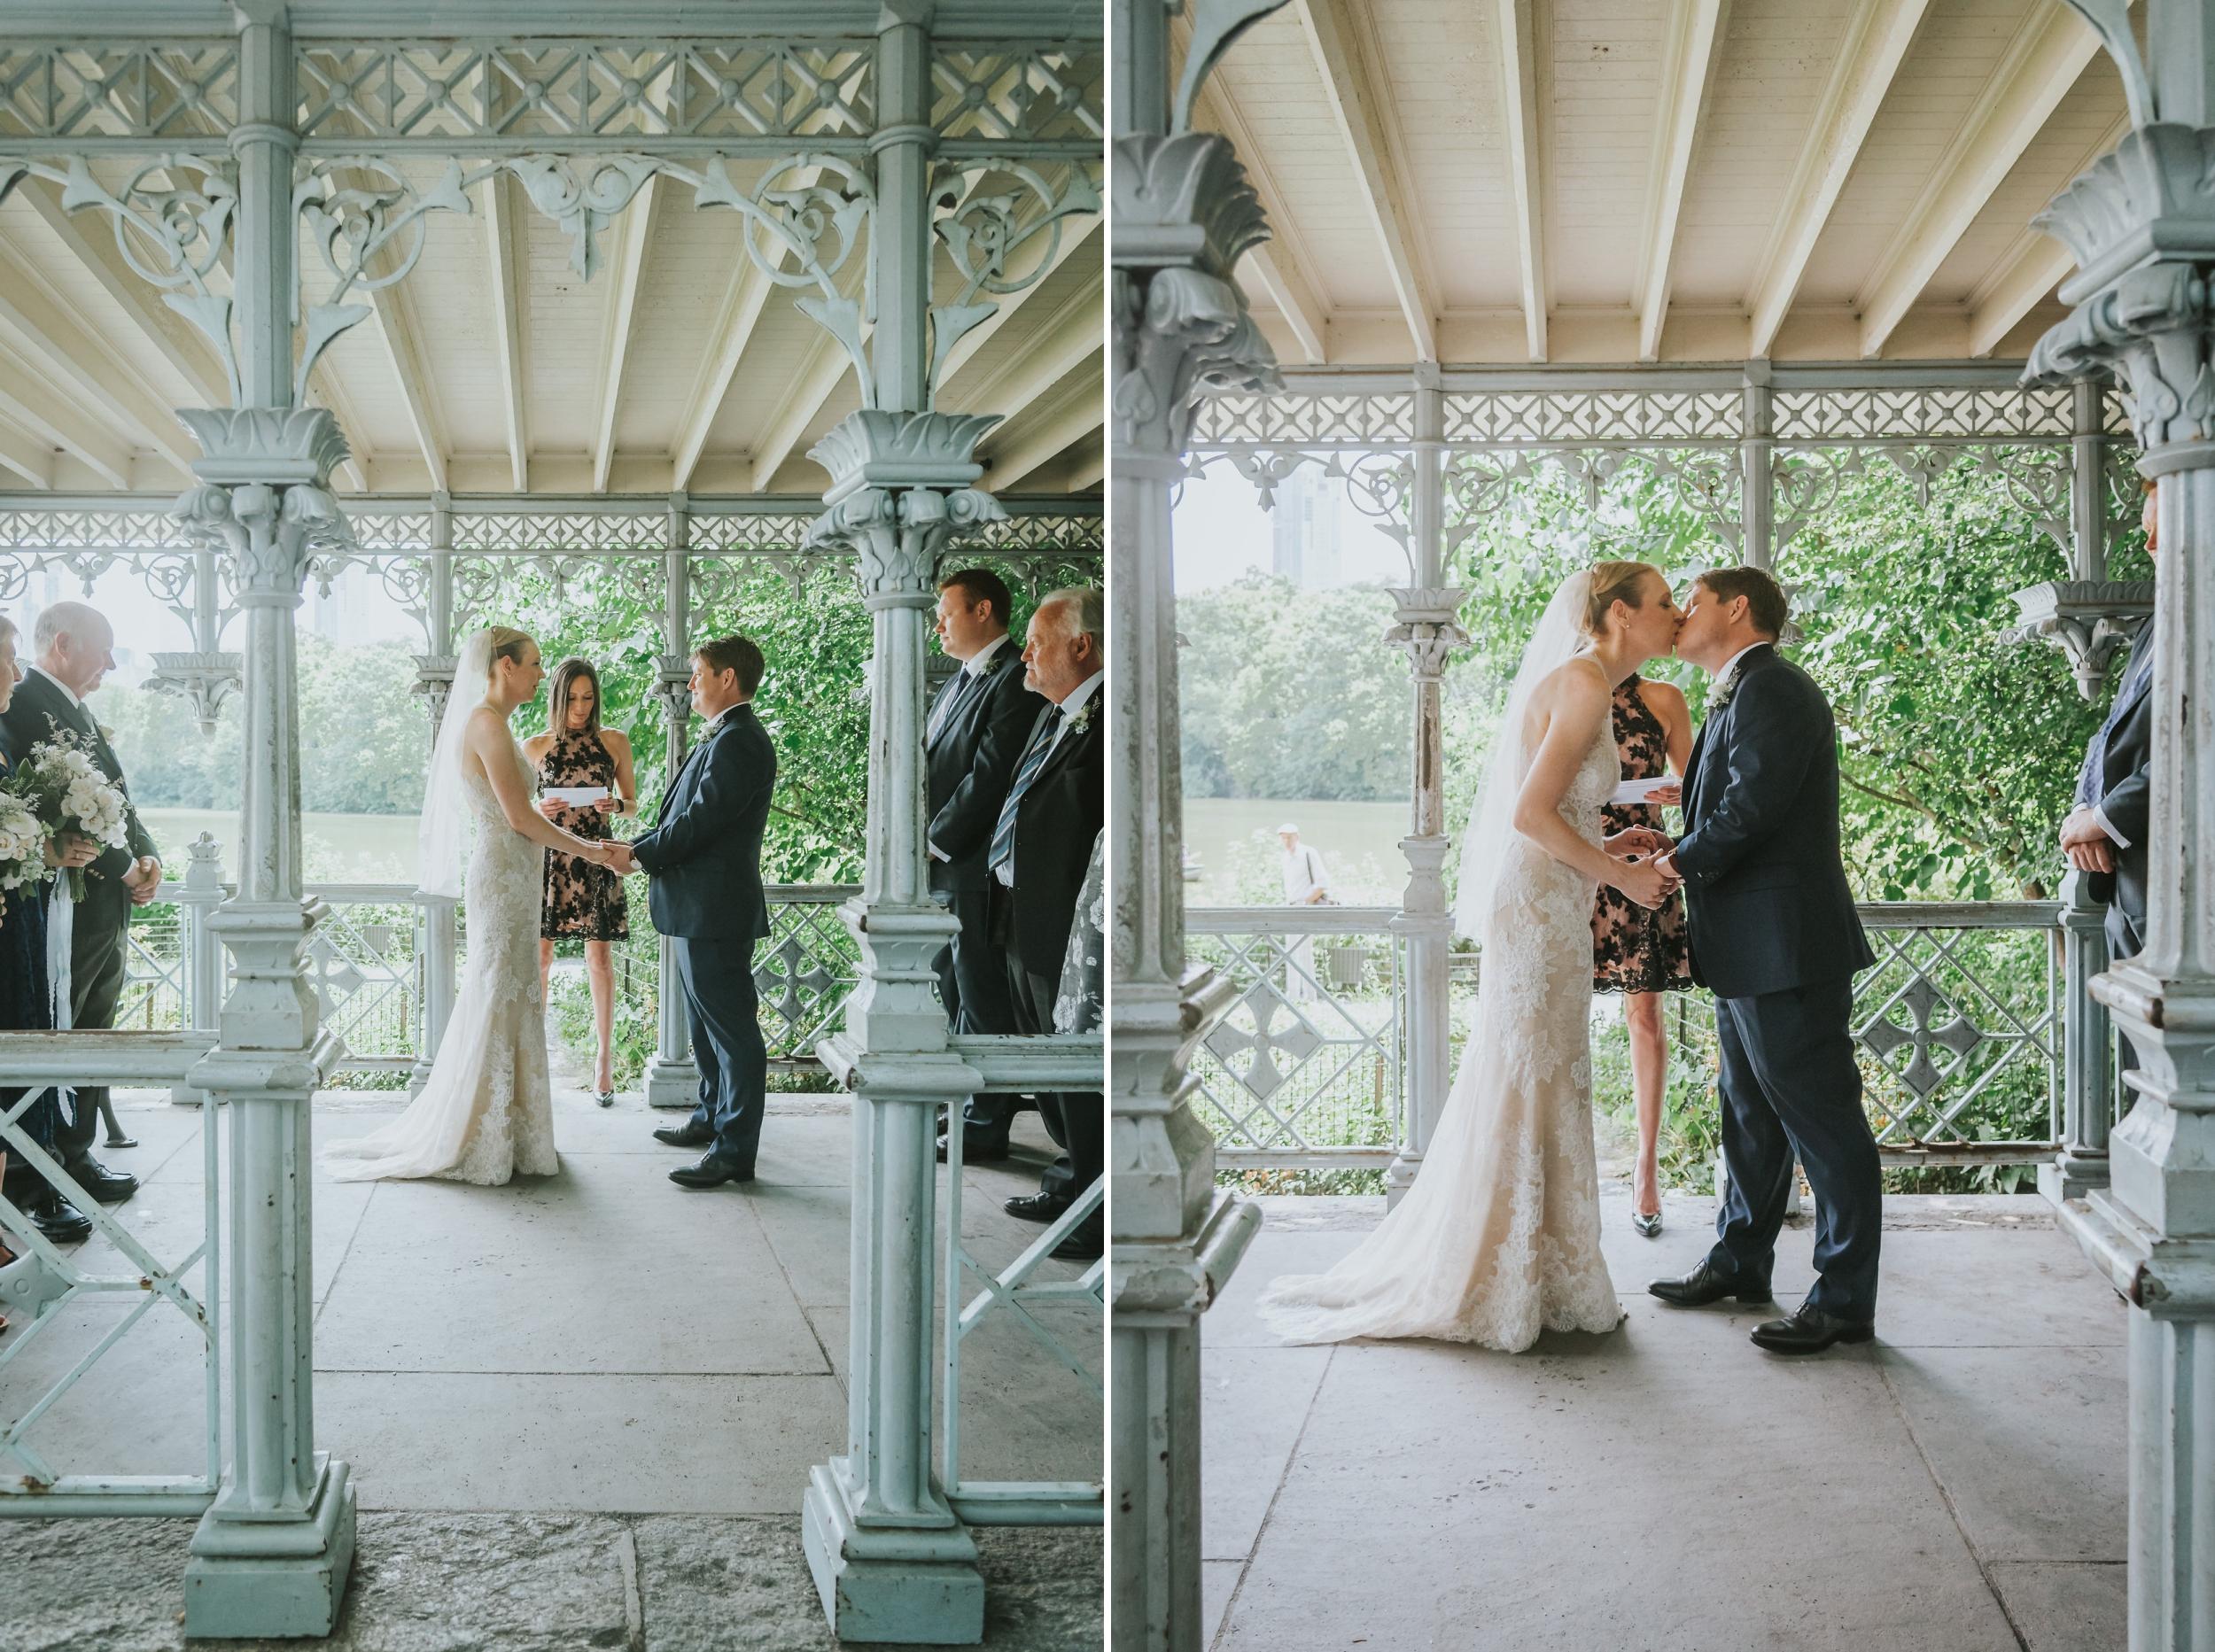 Rebecca & Matt Ladies Pavilion Central Park Elopement NYC Wandermore Photography (13).jpg